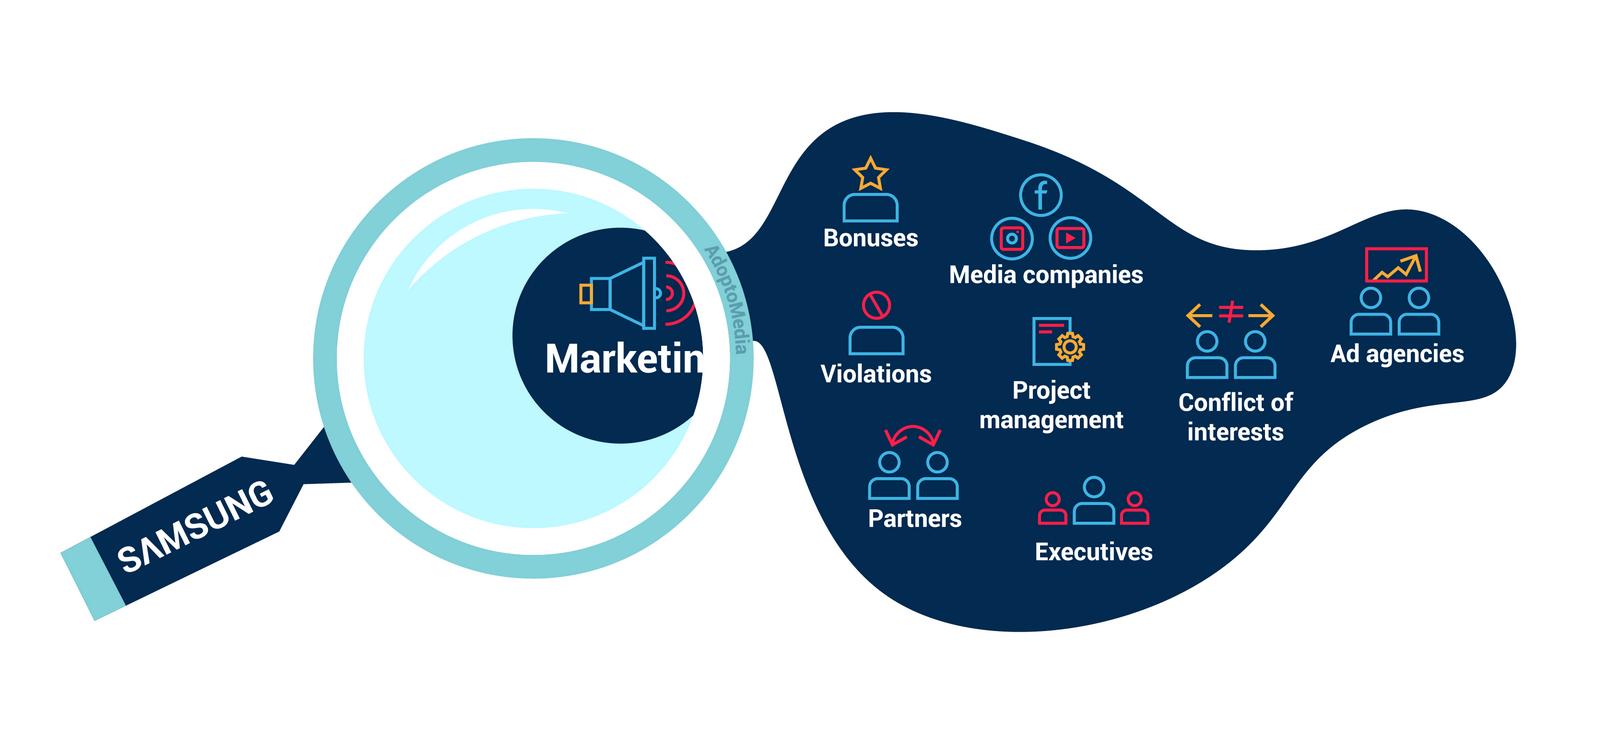 marketing, ad agencies, media companies, transparency issues, violations